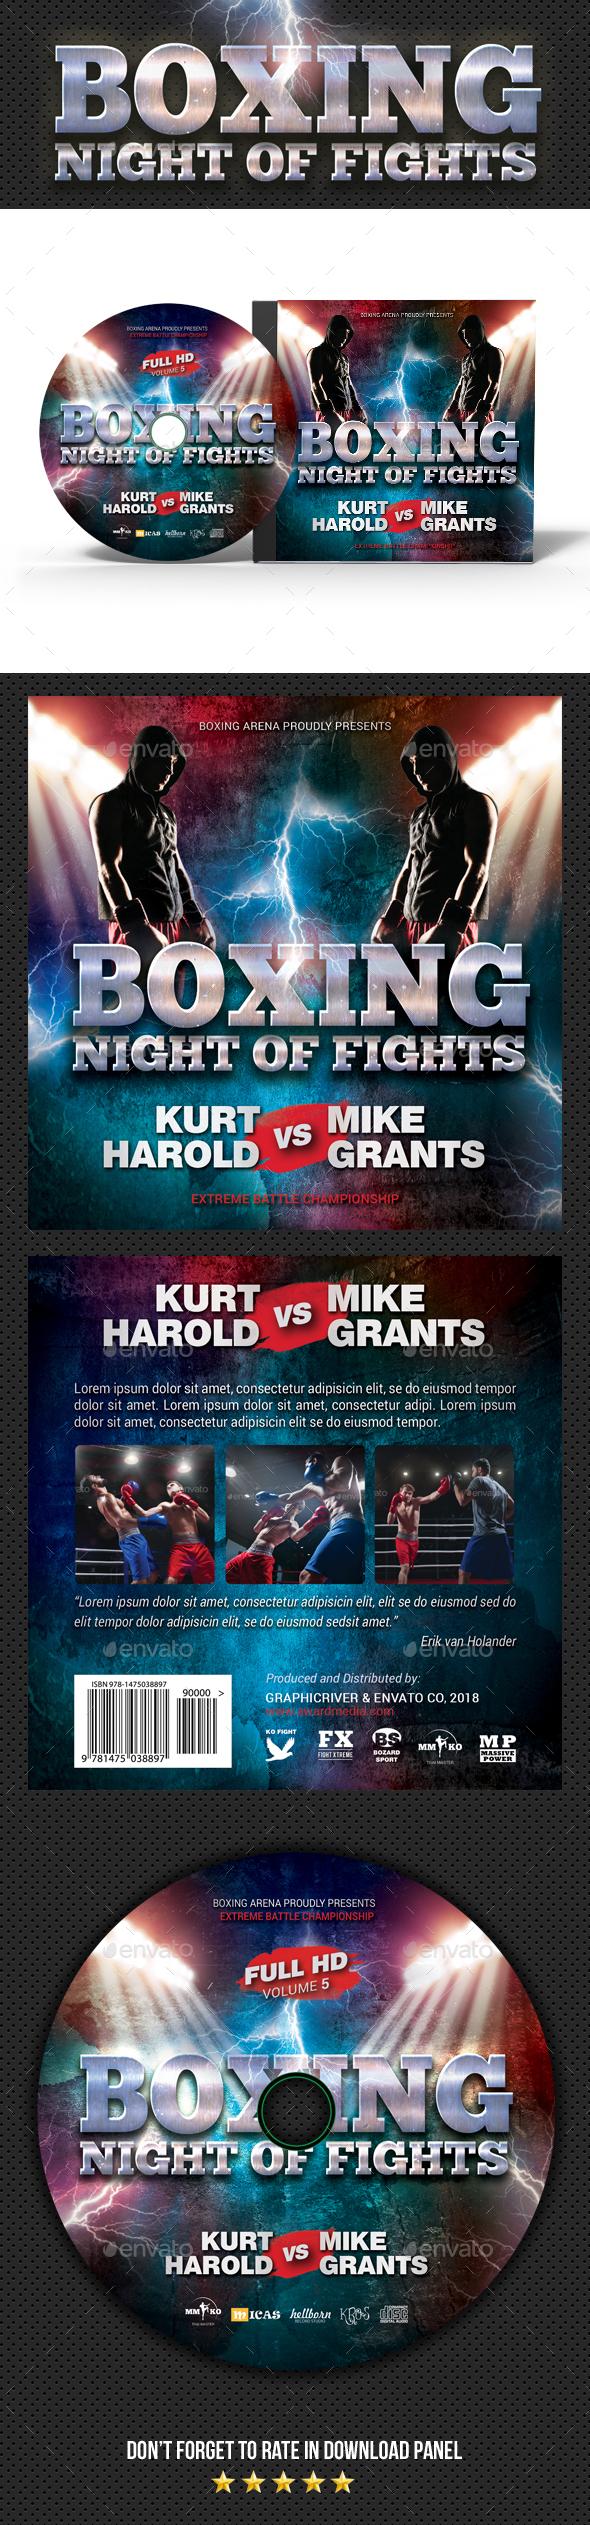 Boxing Muay Thai CD Cover - CD & DVD Artwork Print Templates